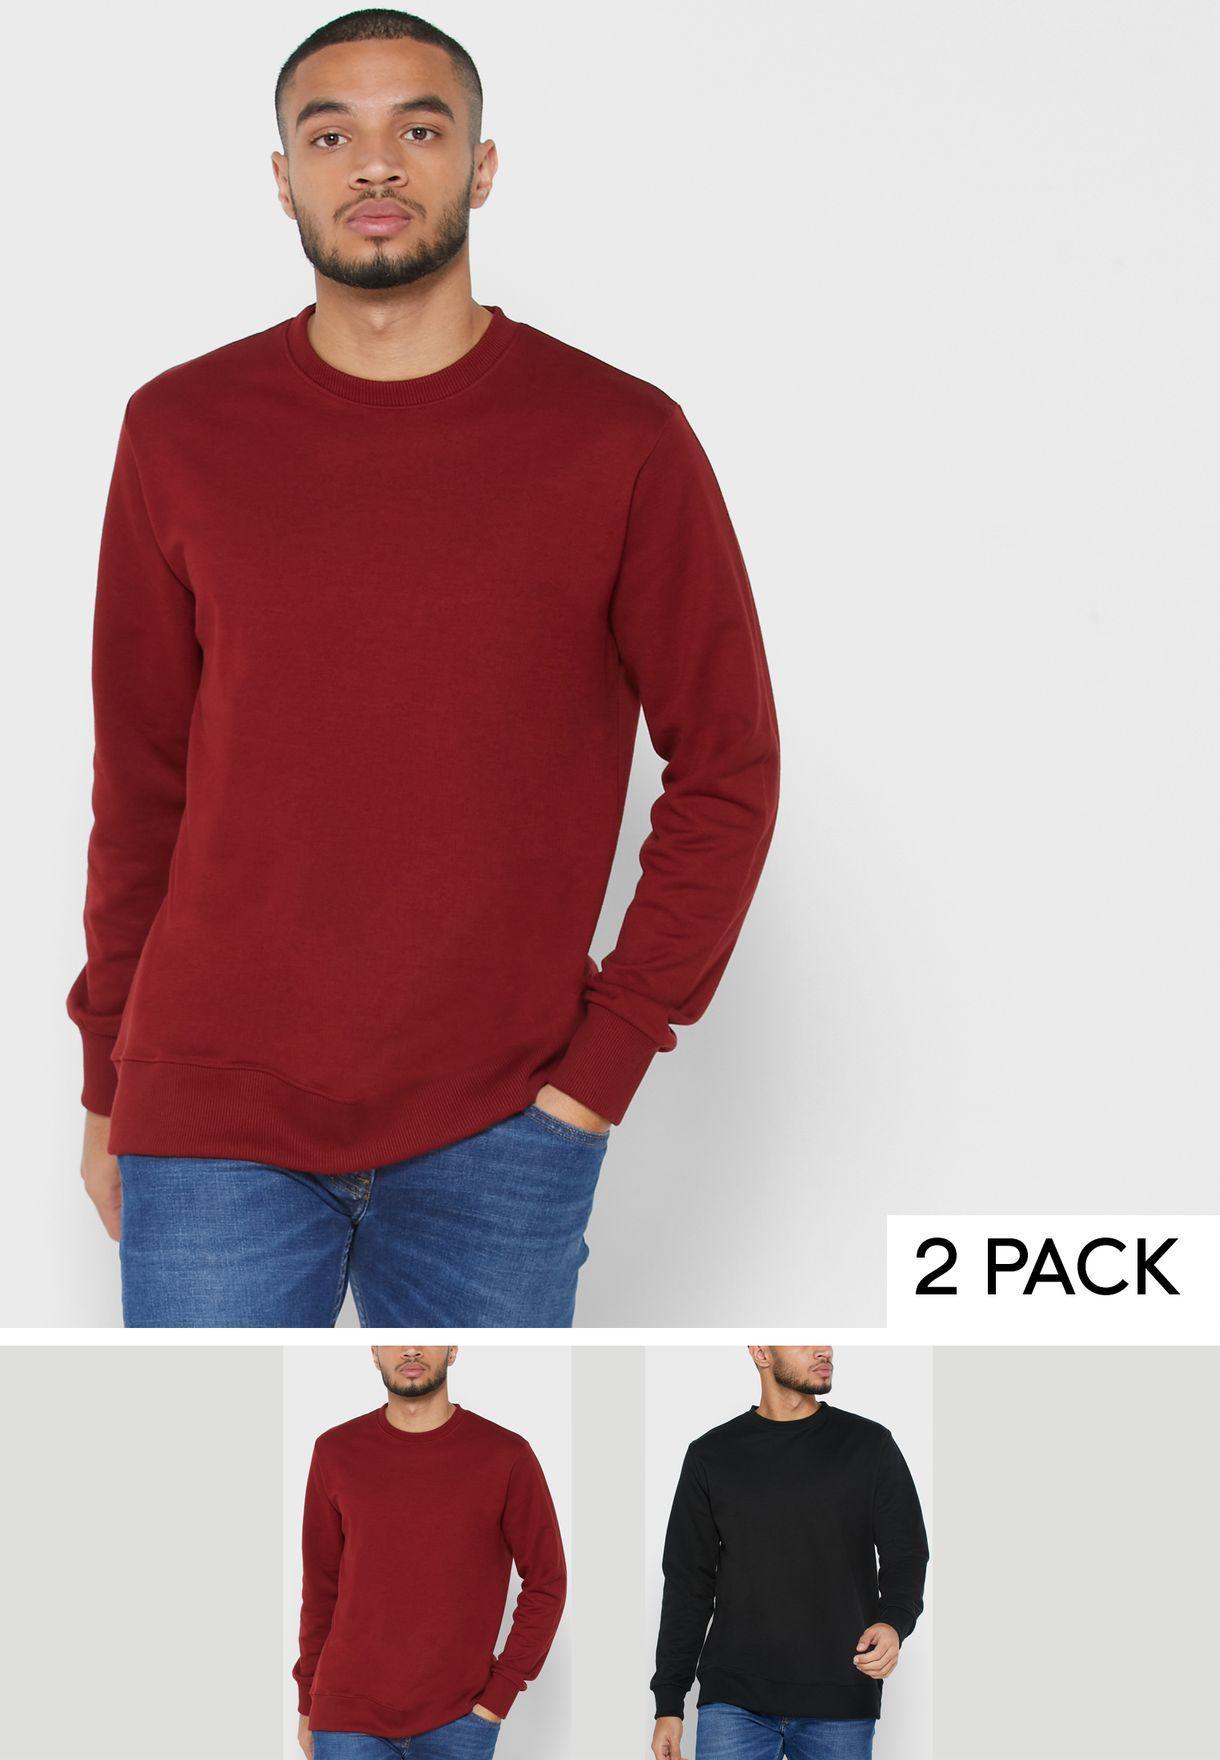 2 Pack Sweatshirts